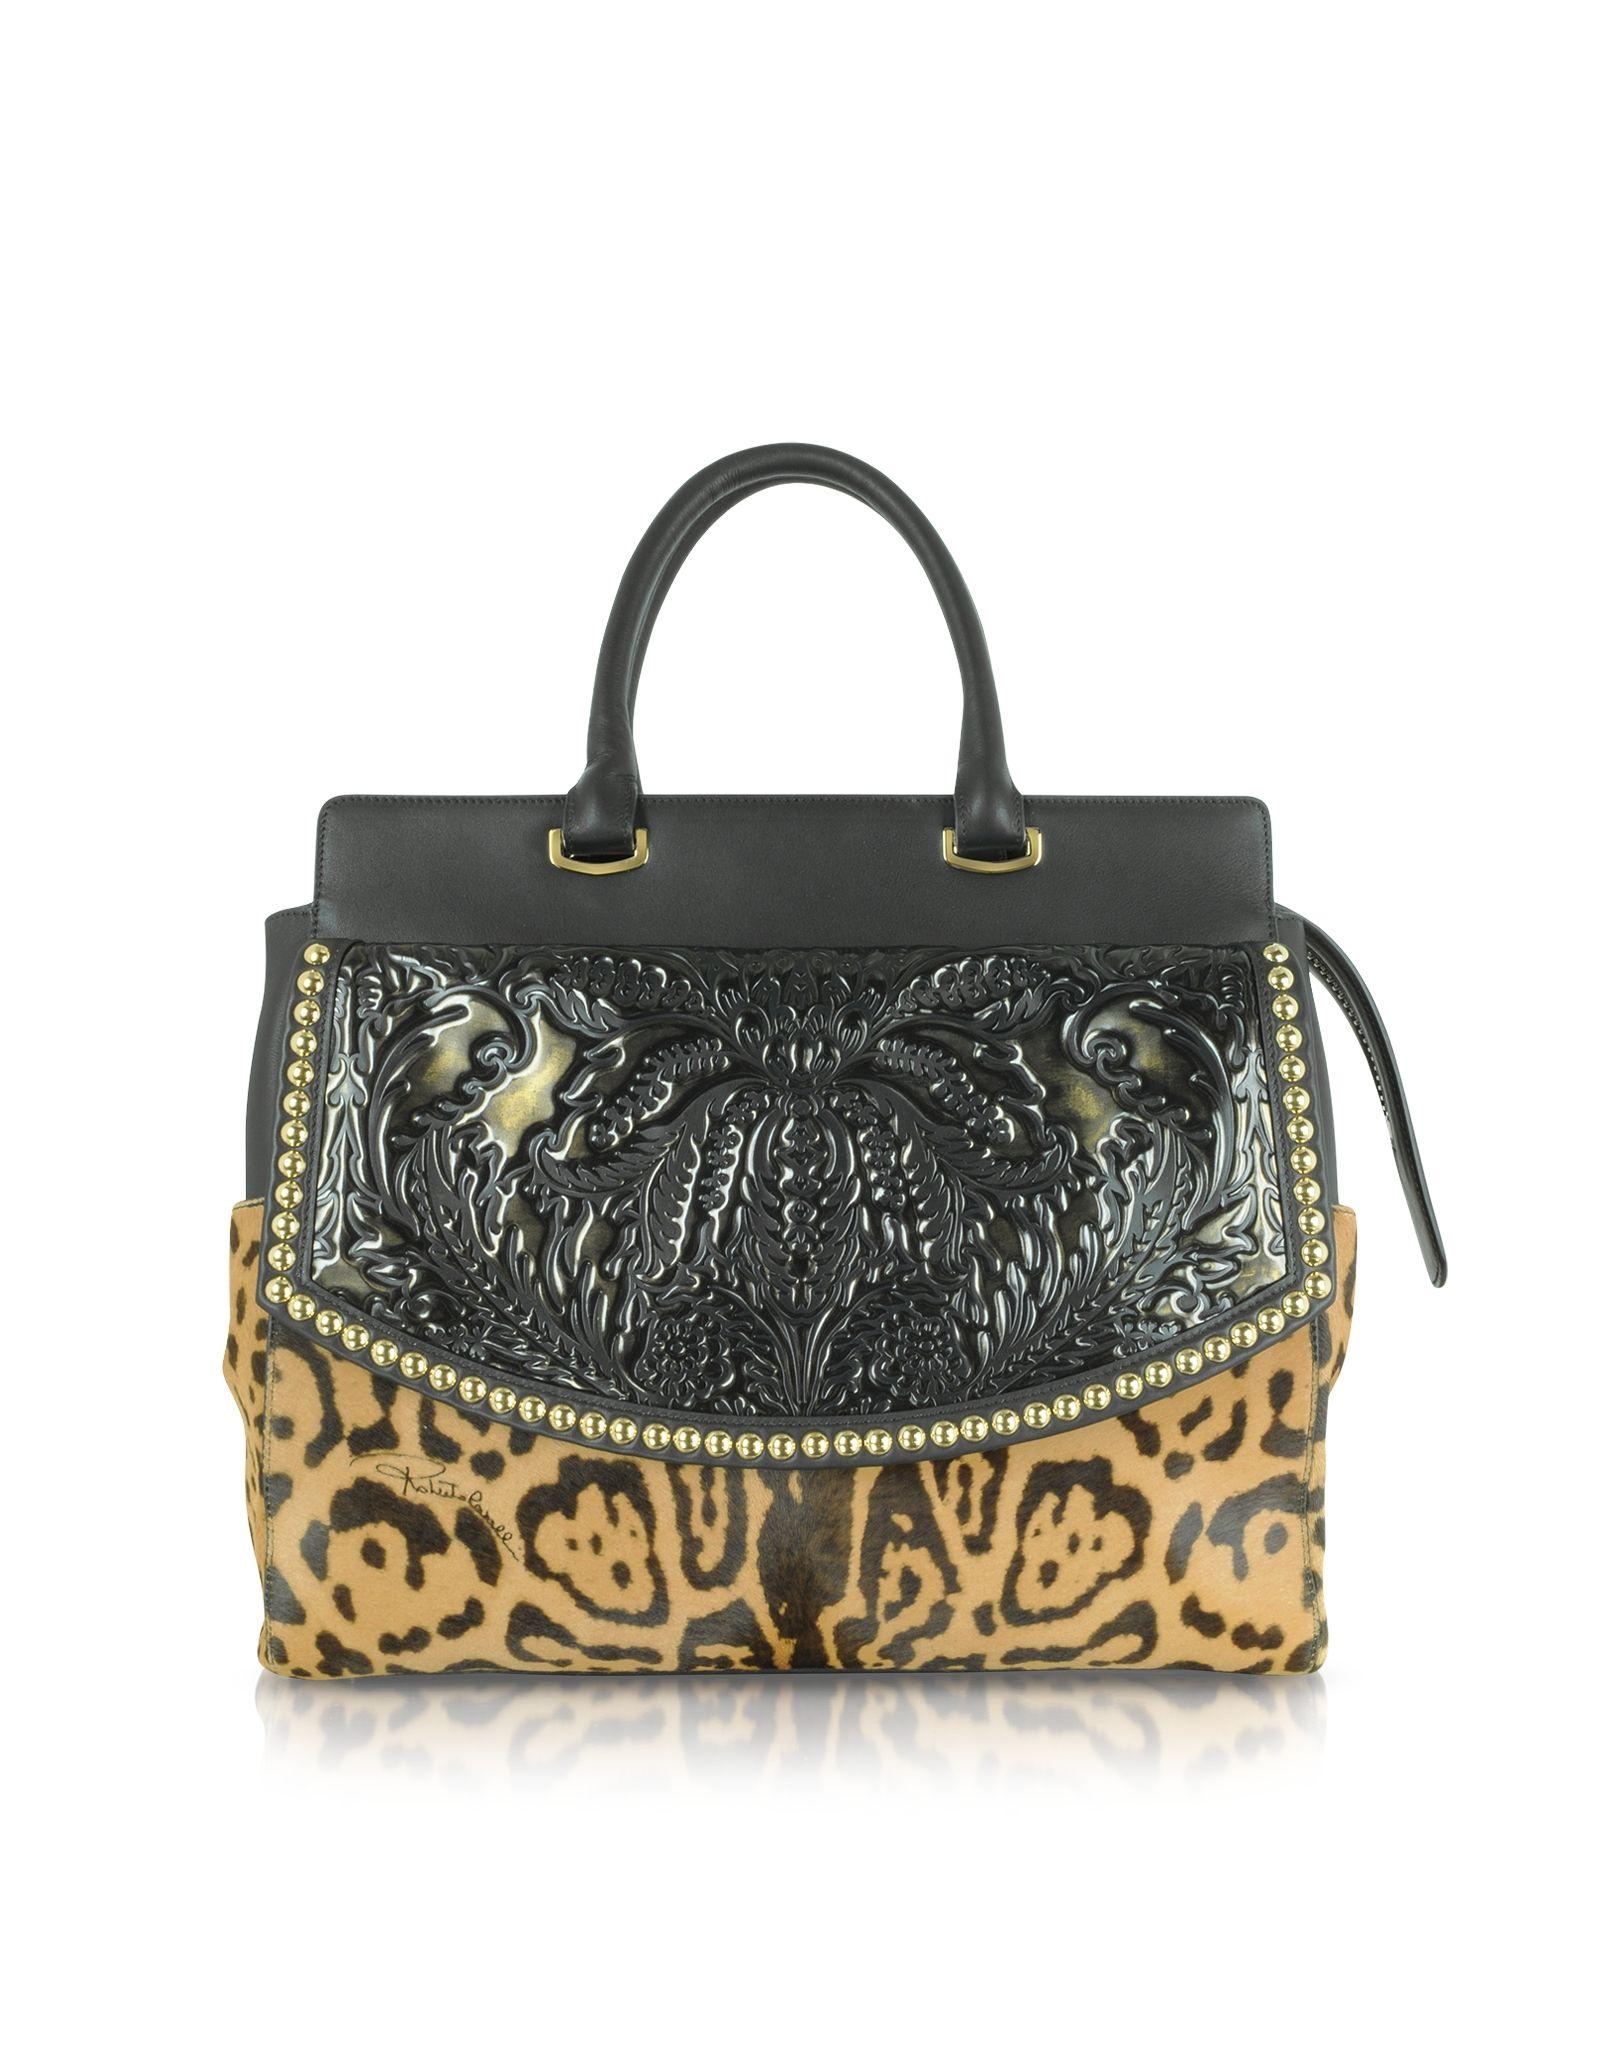 print product leather bags mini lyst jaguar gallery black in handbags beige givenchy normal shoulder bag pandora